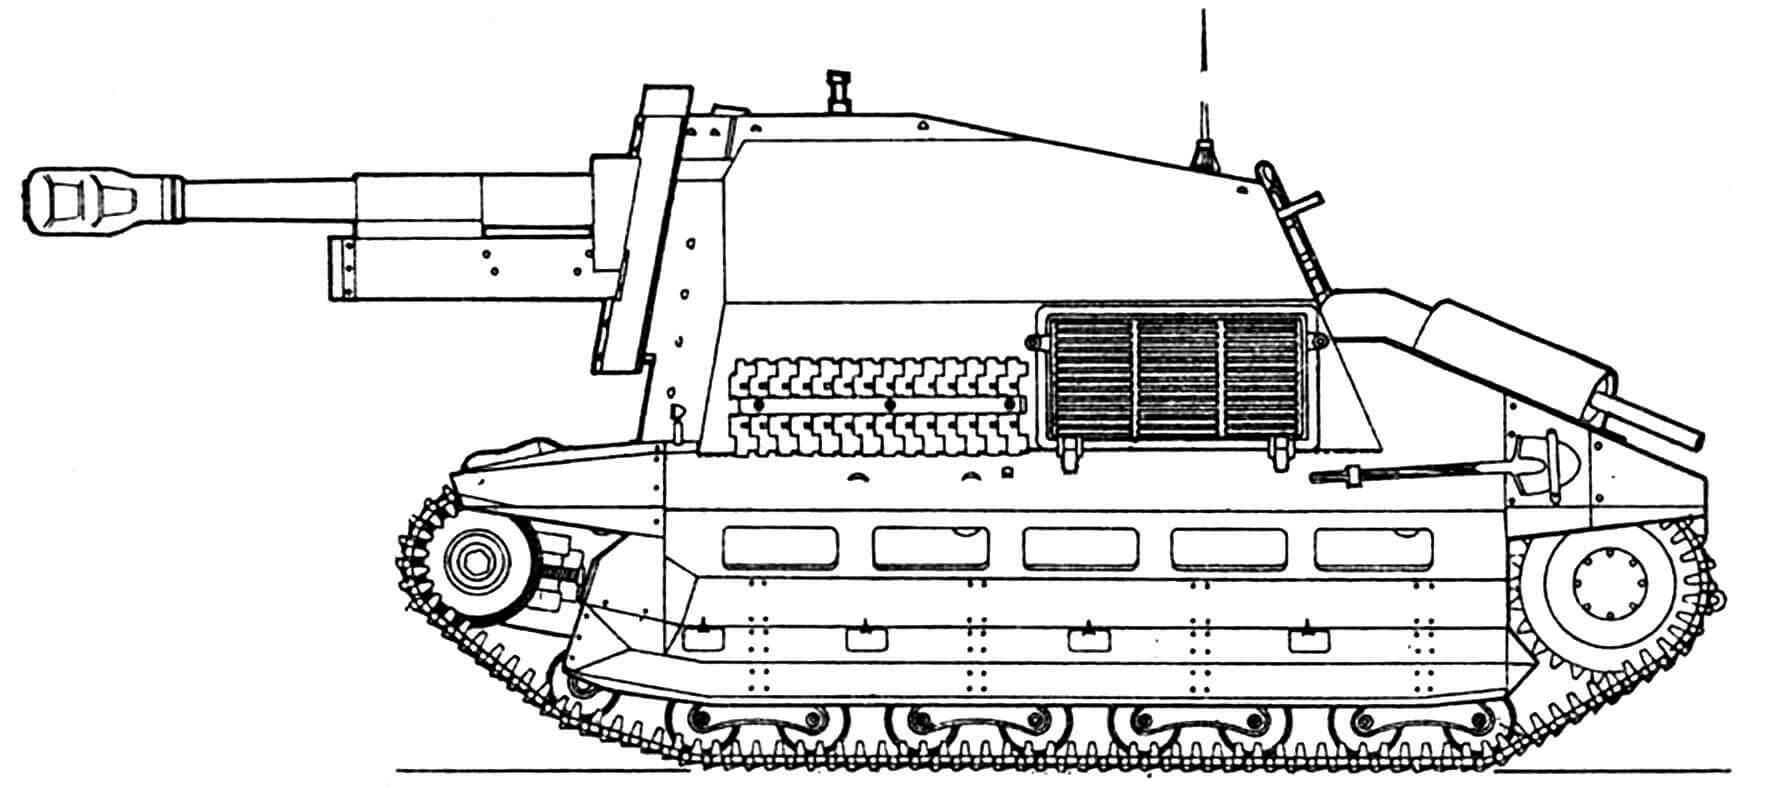 10,5-cm leFH(Sf) на базе танка FCM